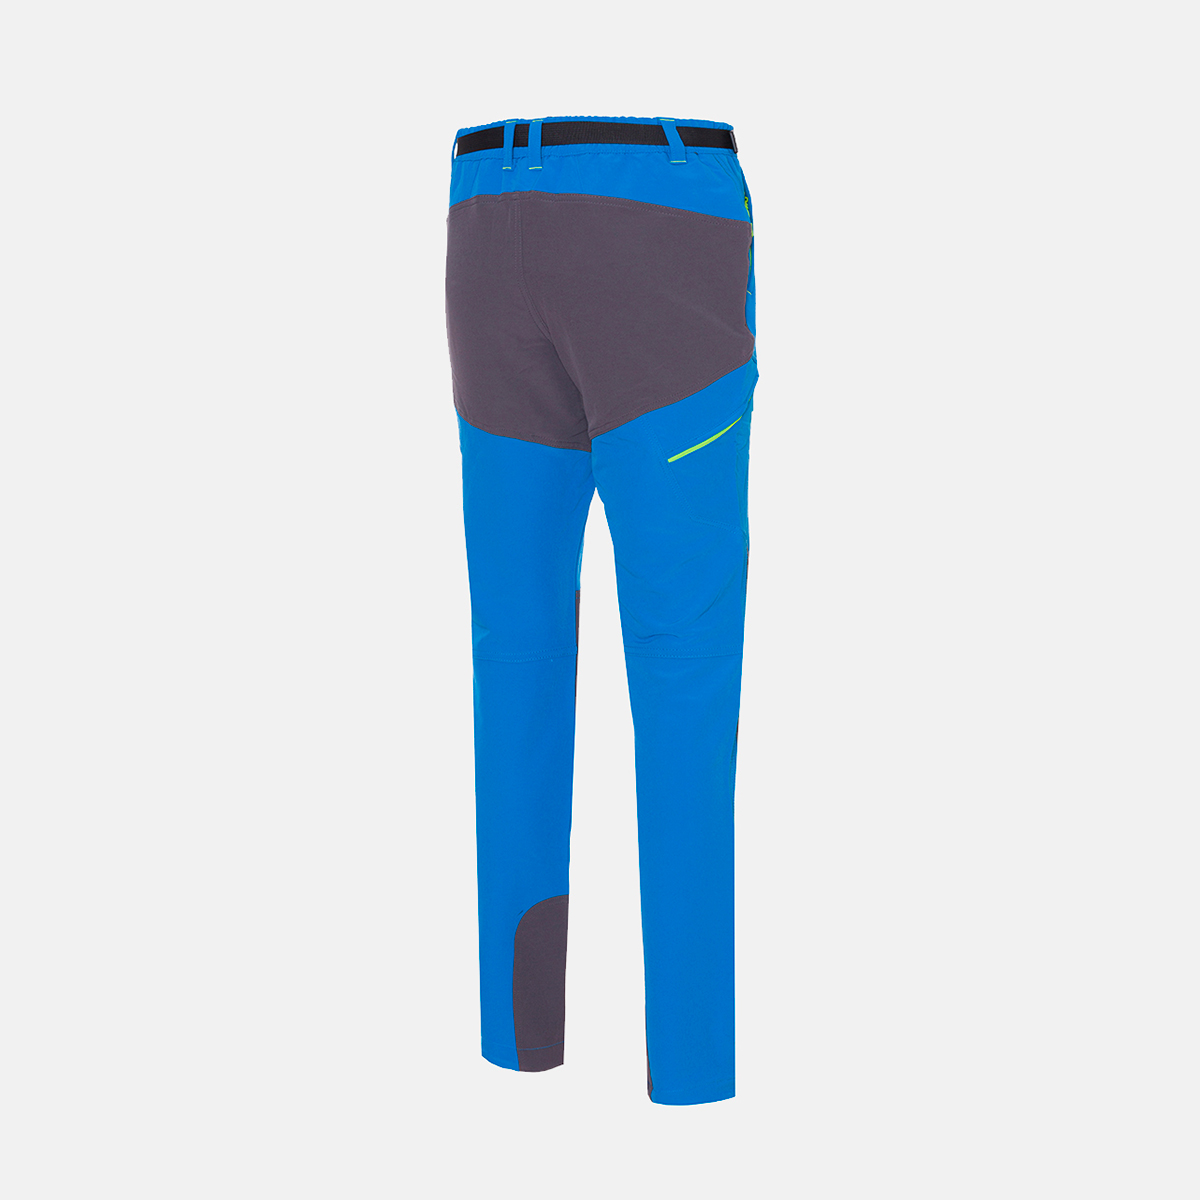 MAN'S BALTIC STRETCH PANT BLUE